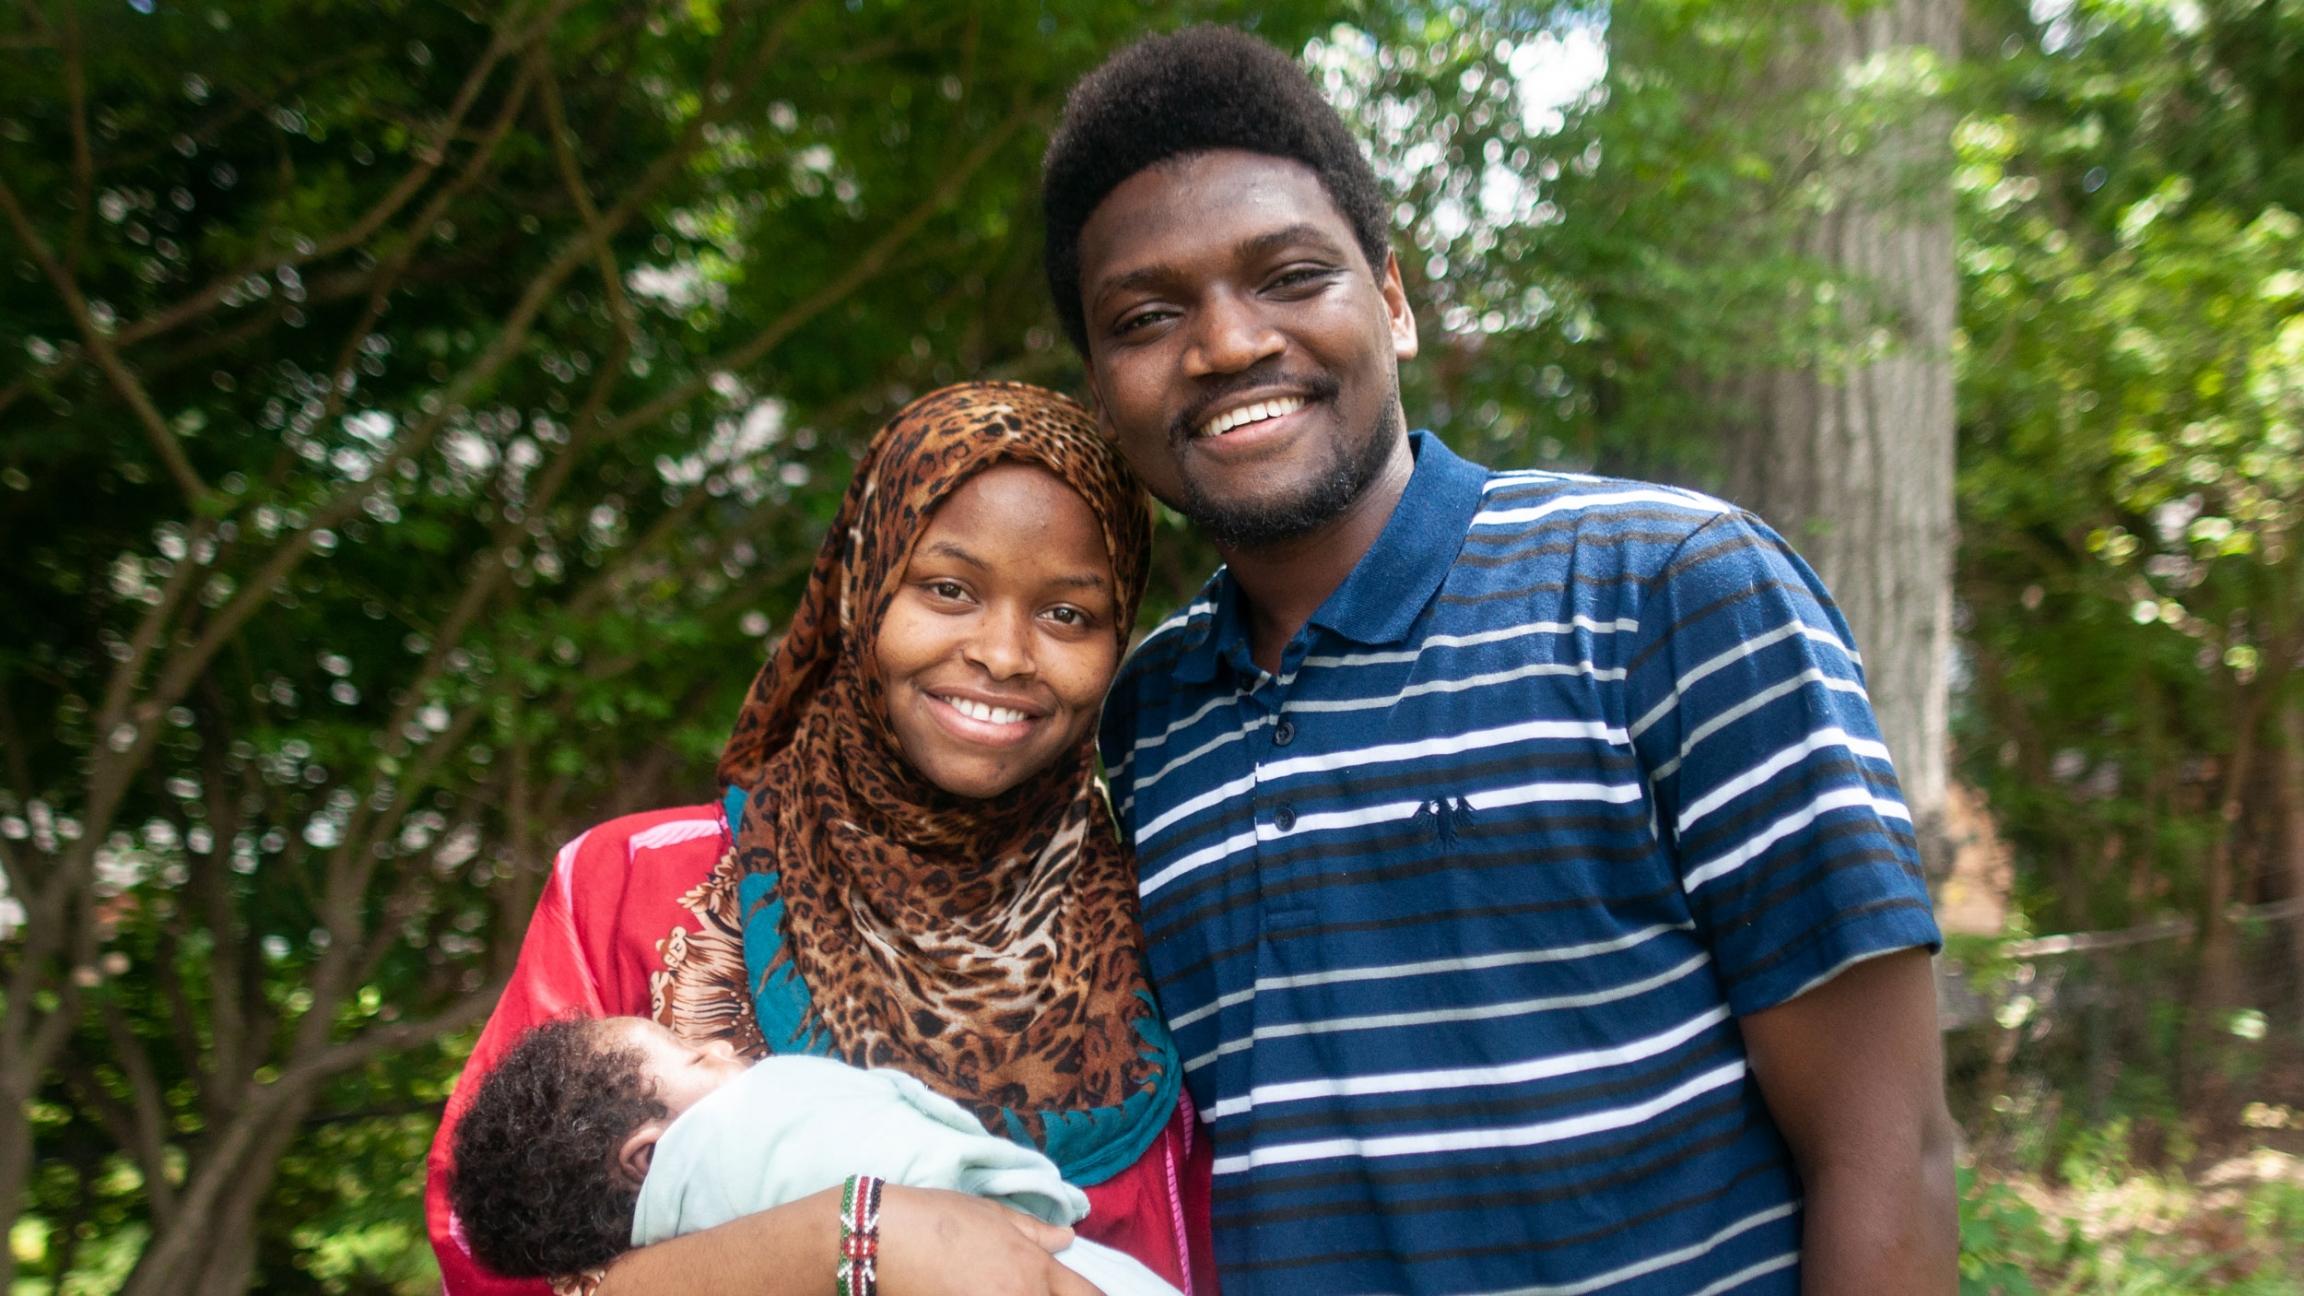 Rumbila Abdullahi and her husband, Ibrahim Abdi, hold their newborn son, Nabeel, outside their home in Springfield, Massachusetts.